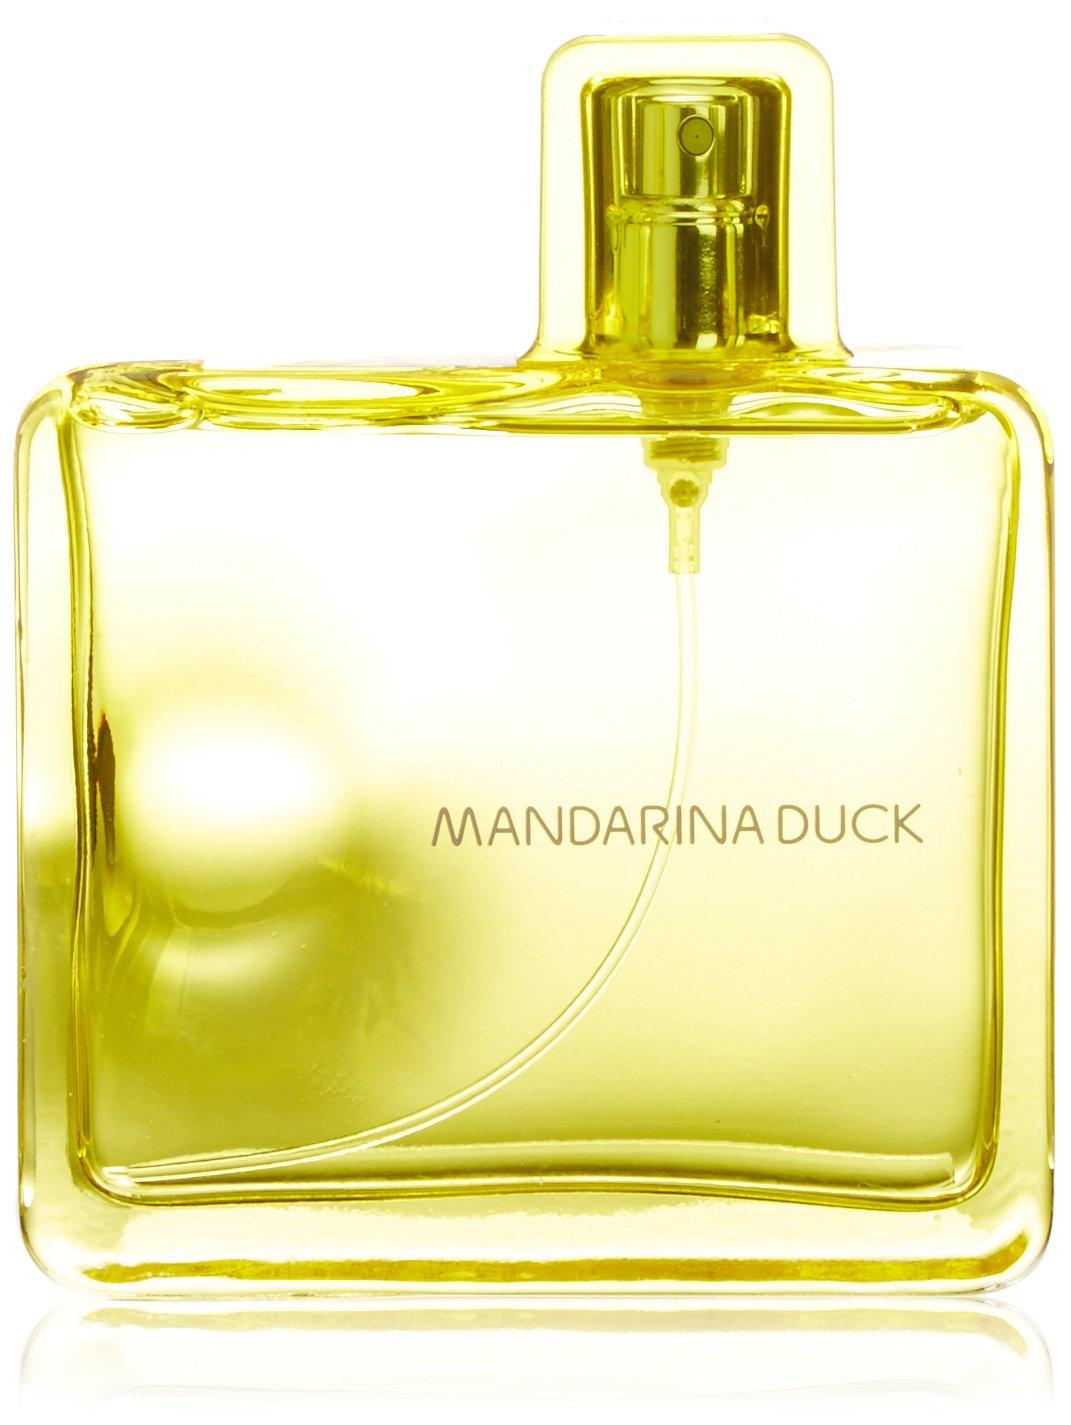 Mandarina duck logo images galleries for Mandarina duck perfume